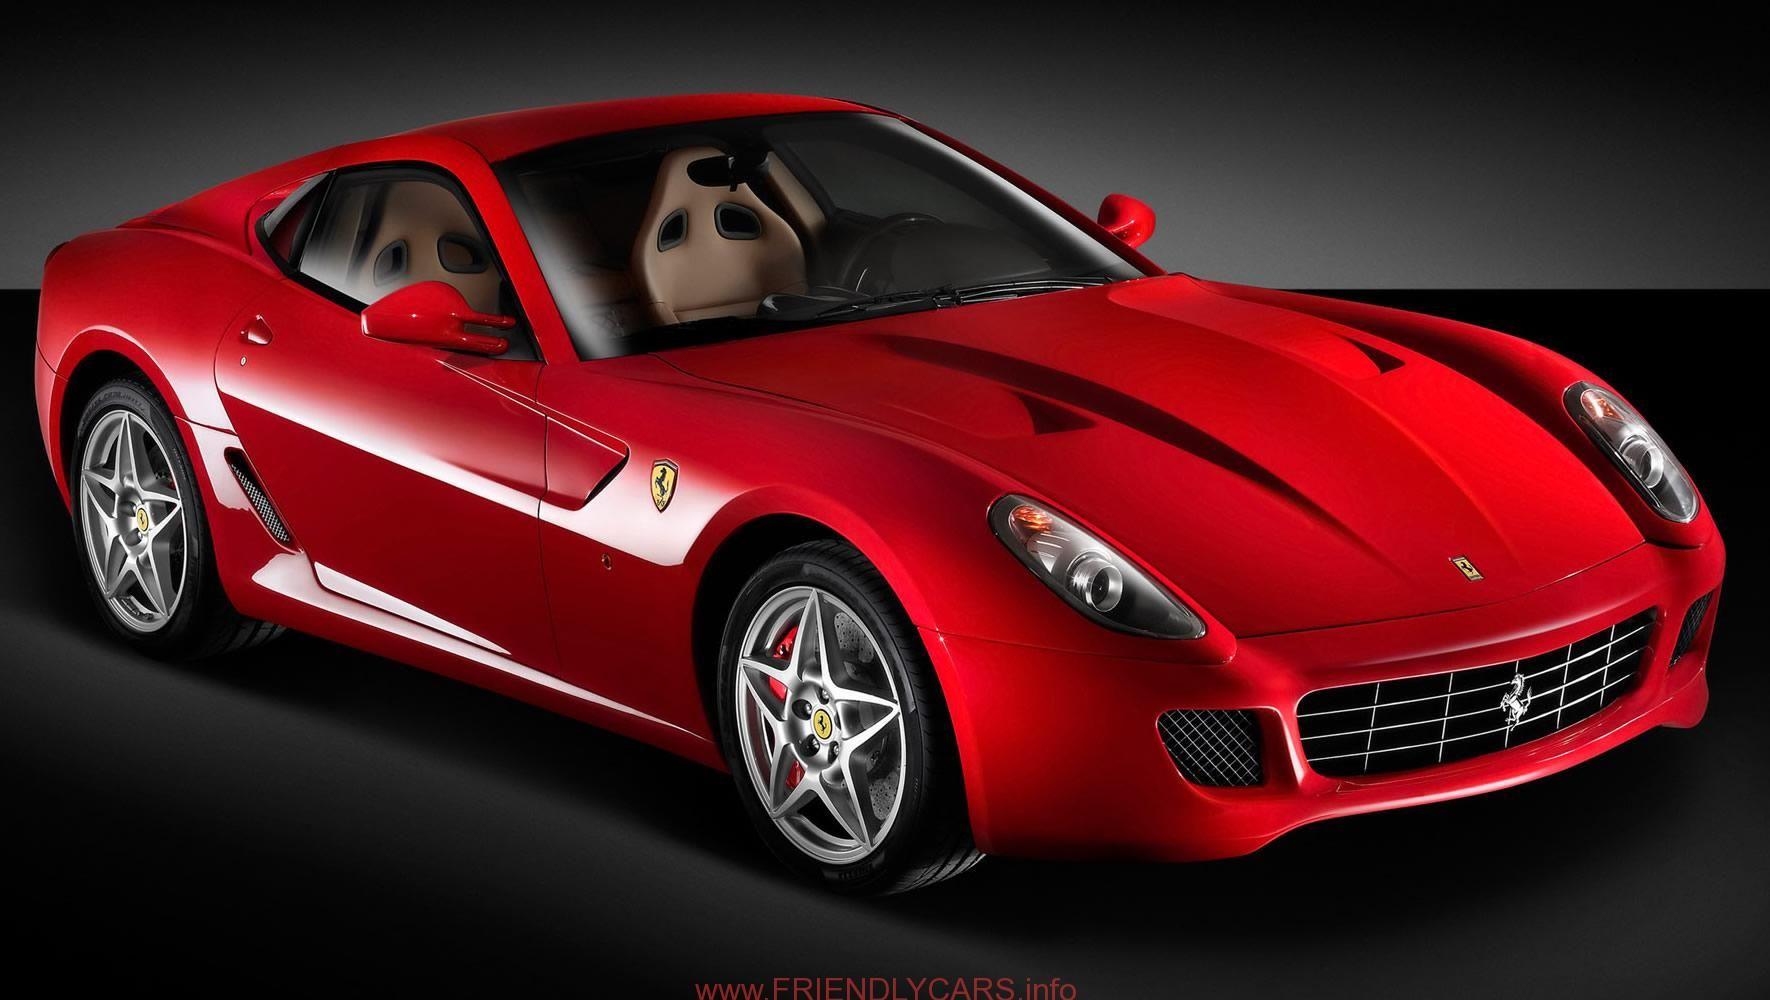 Nice ferrari price range car images hd ferrari 599 gtb sport review specs price pictures